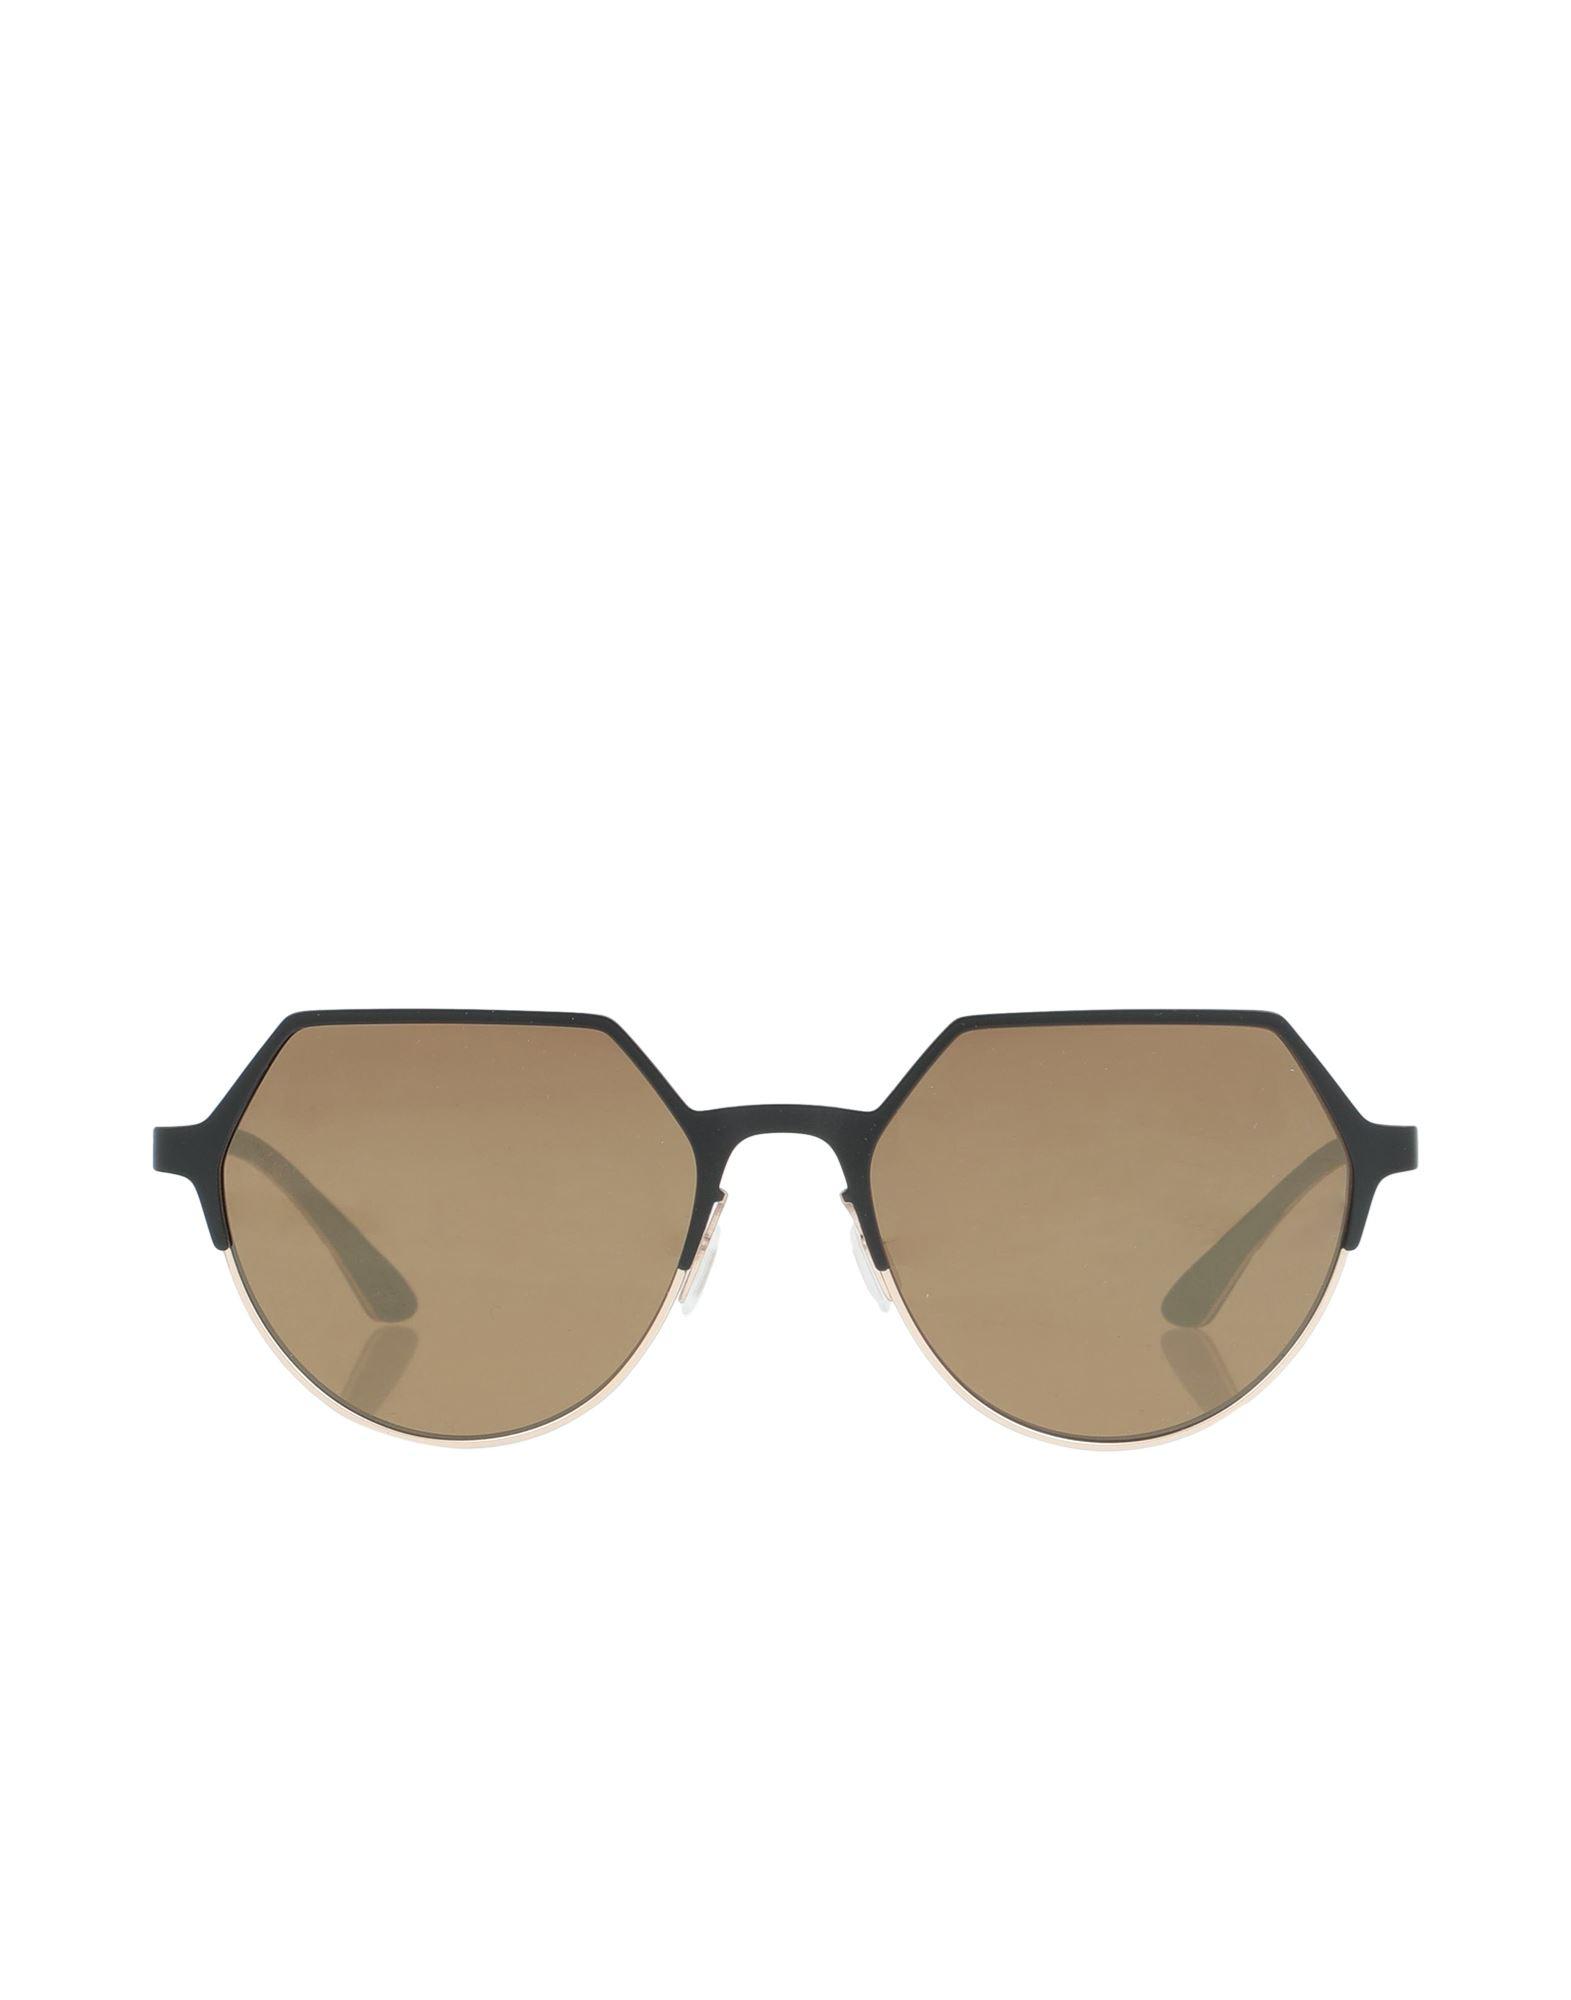 ADIDAS ORIGINALS x ITALIA INDEPENDENT Солнечные очки